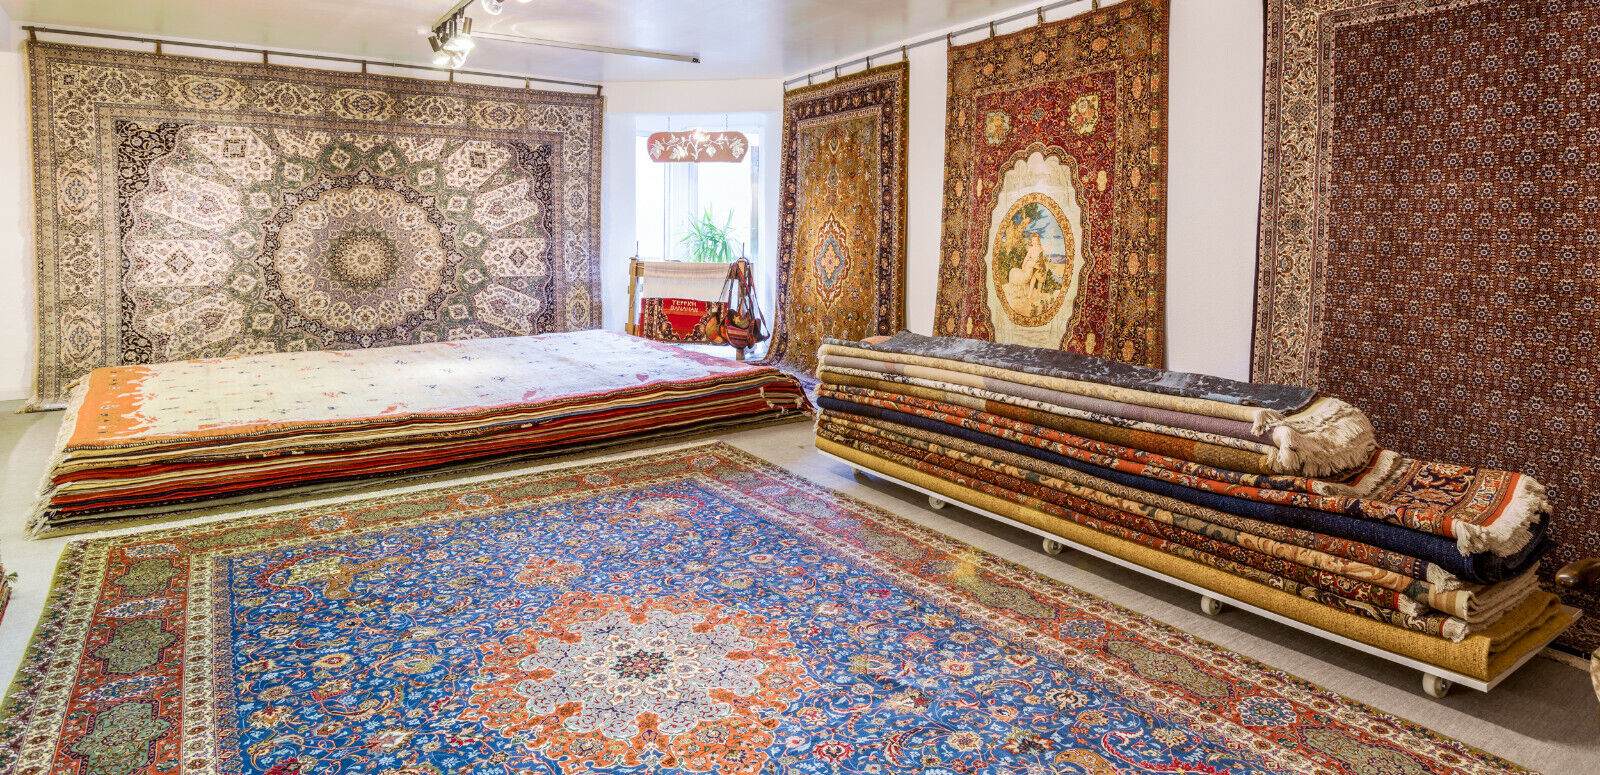 Kilim Teppich Rug Carpet Tapis Tapijt Tappeto Tappeto Tappeto Alfombra Orient Perser Art Galerie 0ac6b5